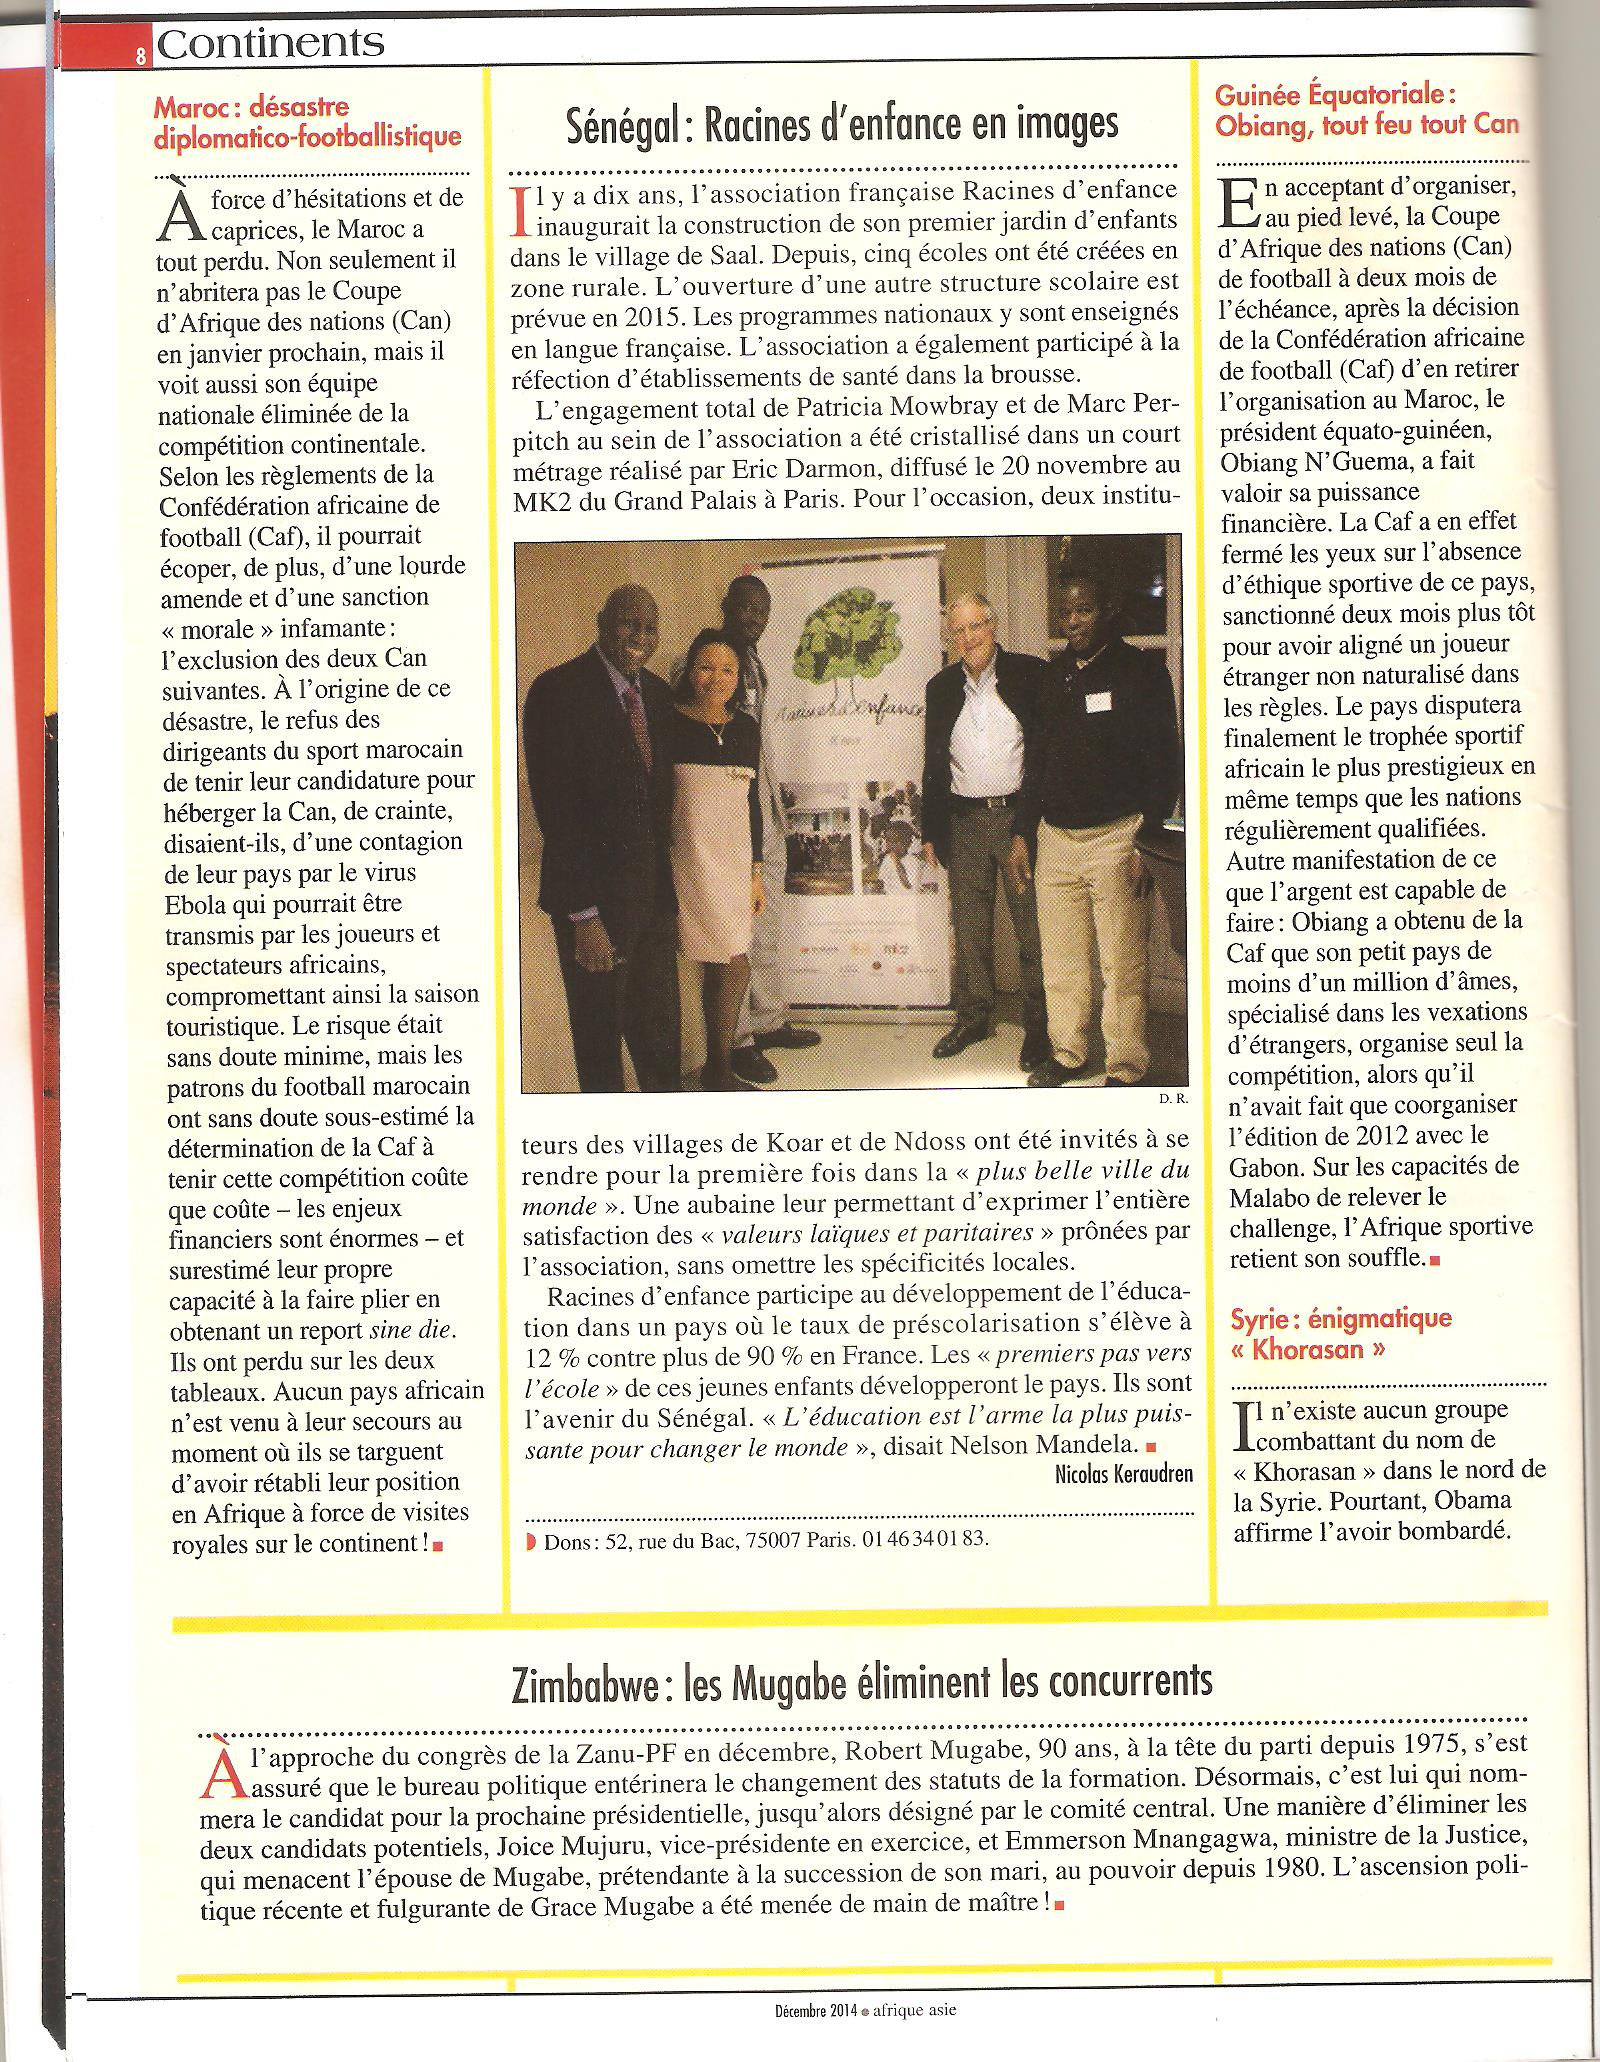 AfriqueAsie article1 12-2014_jpeg_jpeg